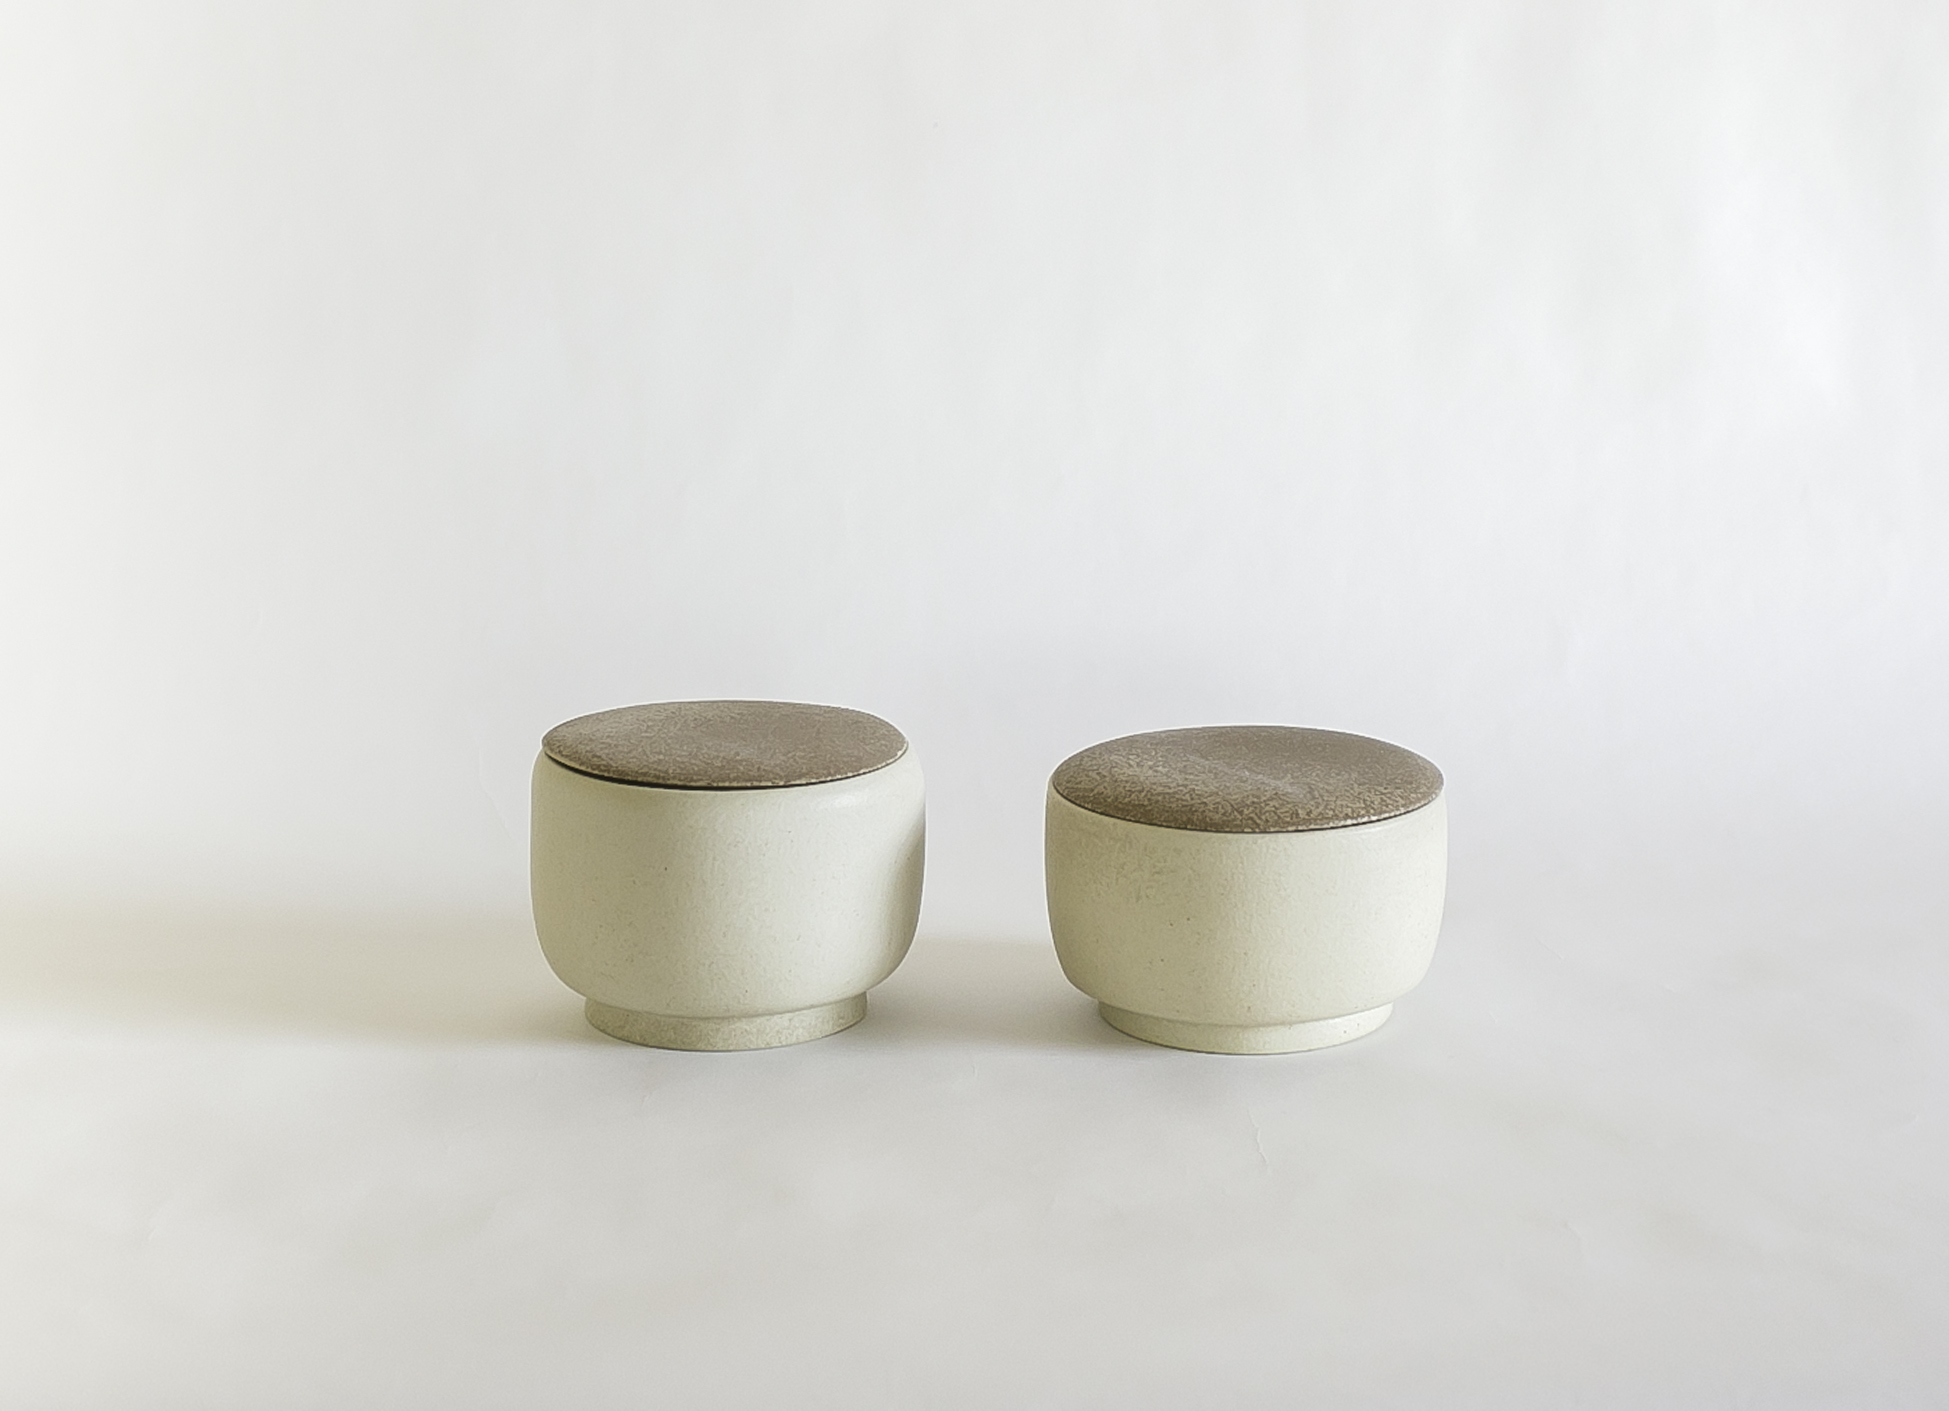 b6_mdba_mdby_ceramics_manufactured_porcelain_mushimegane_books